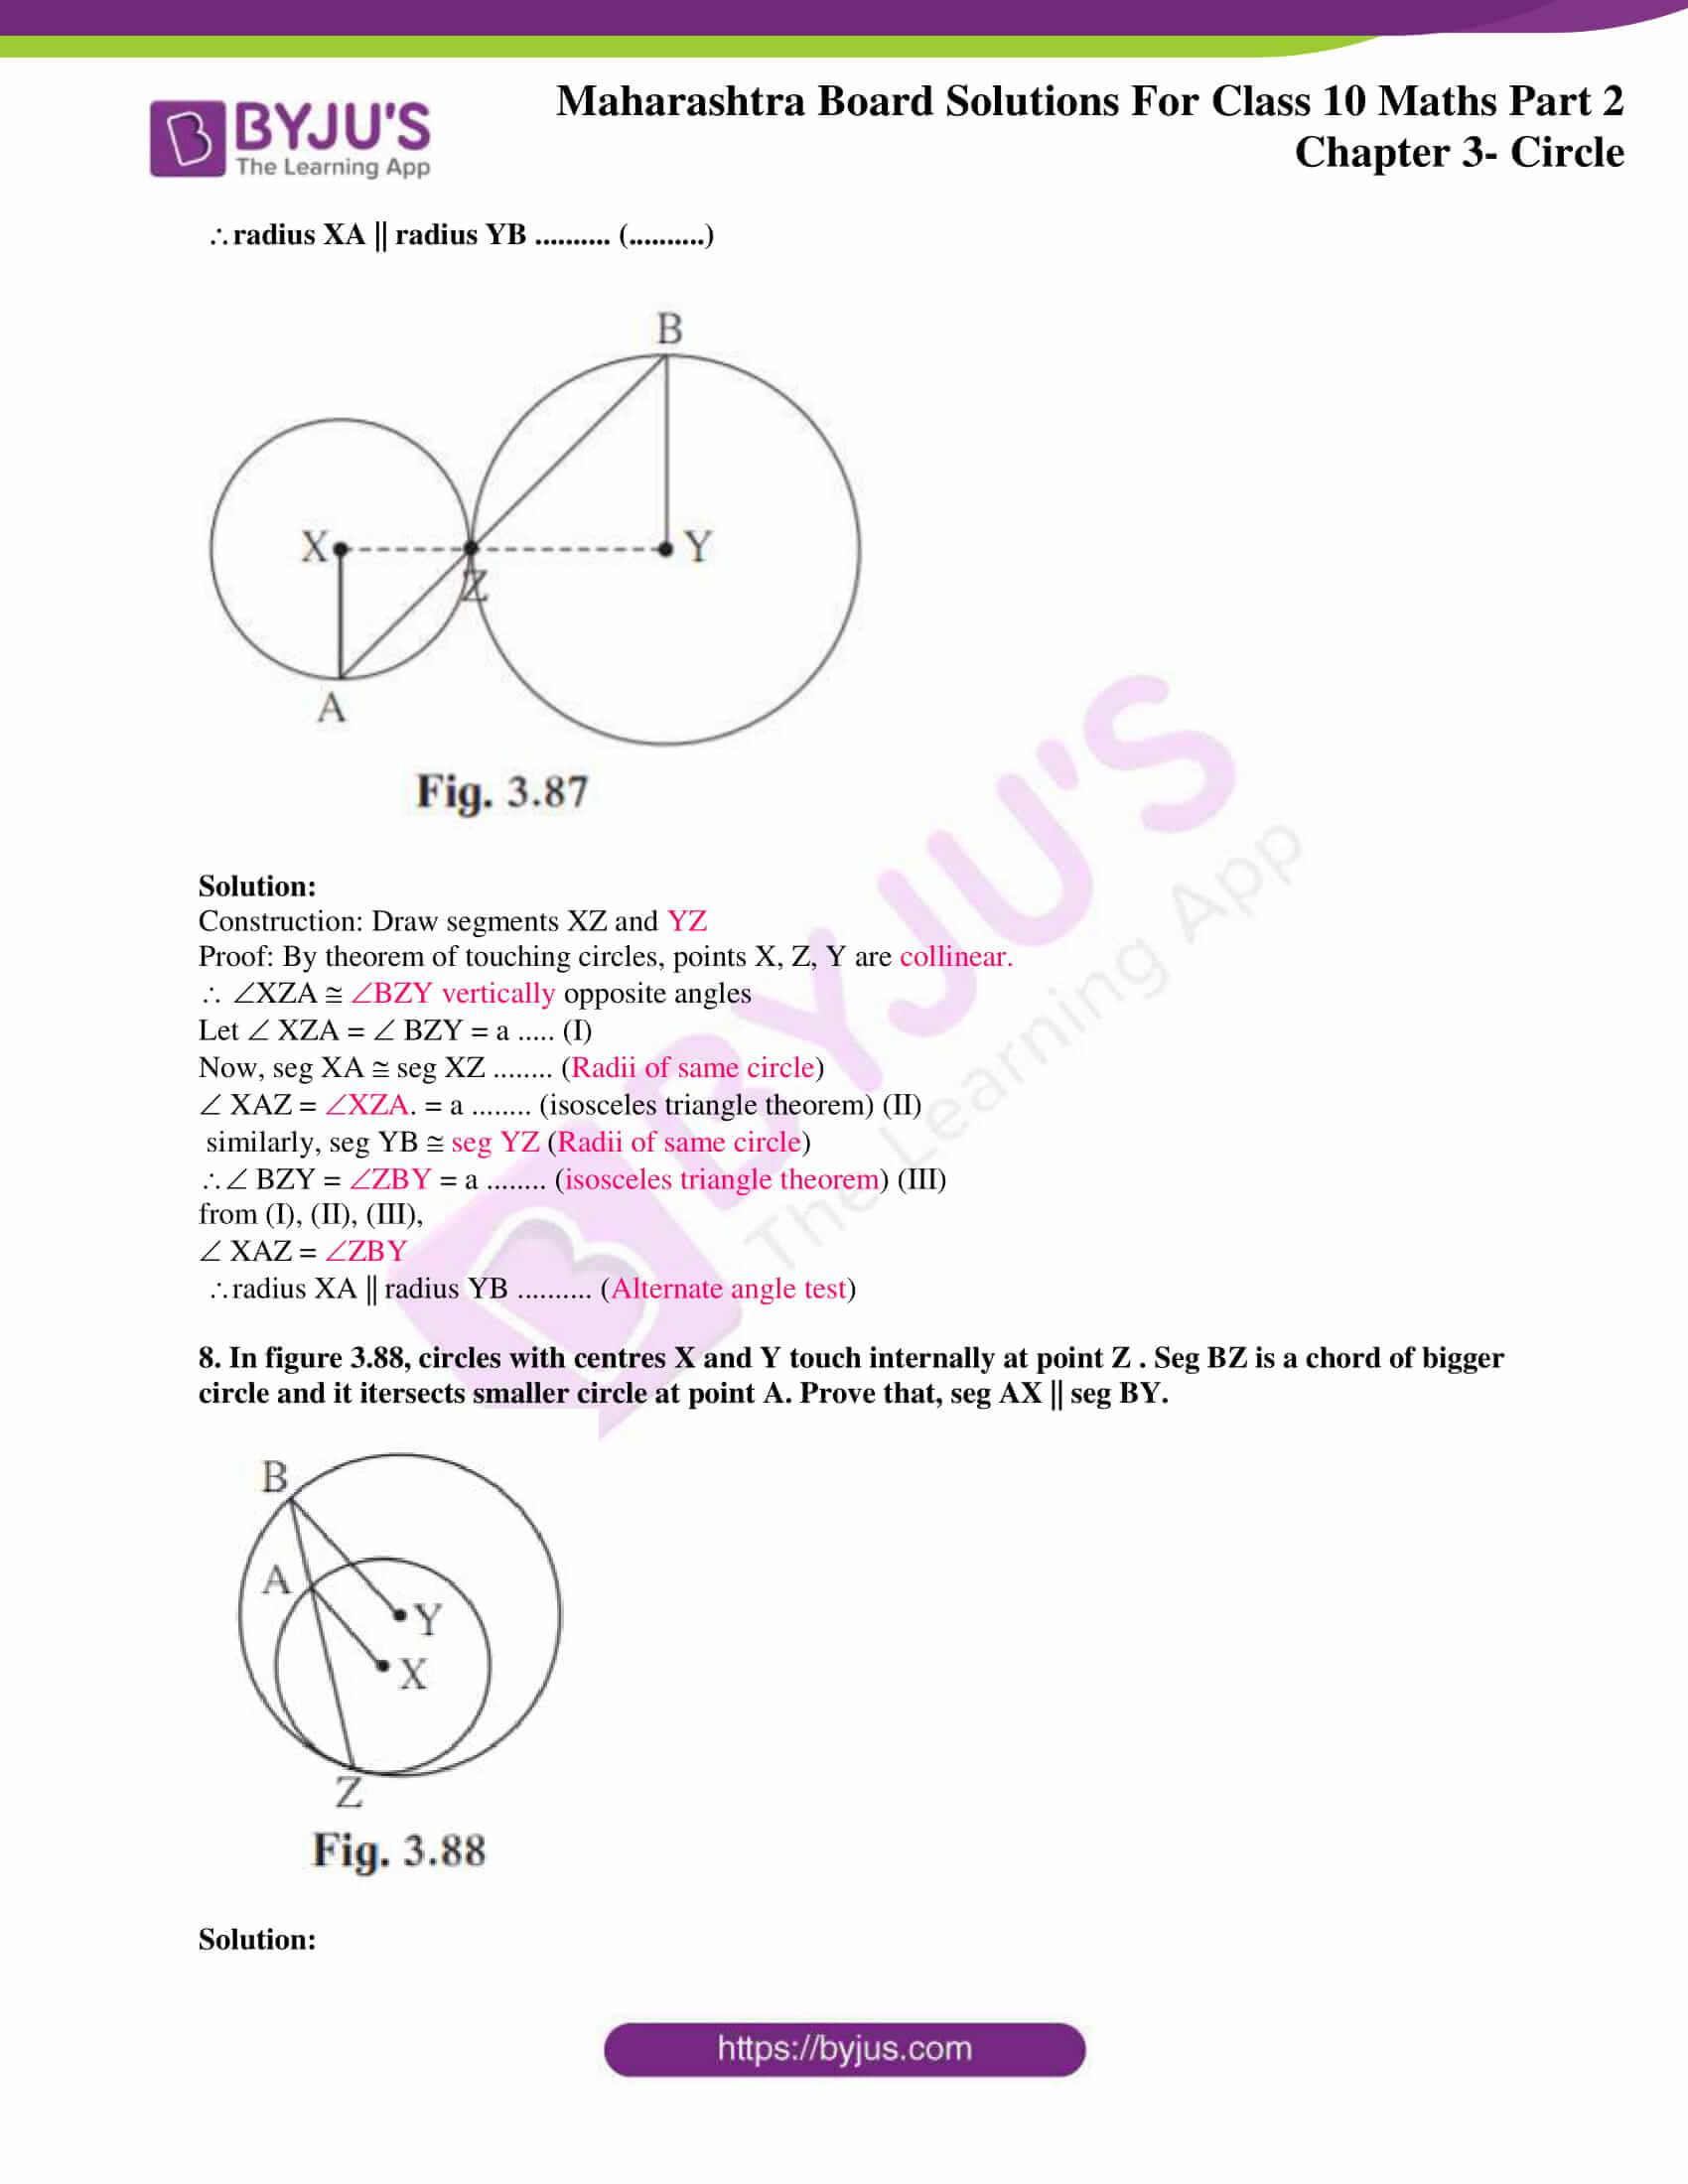 msbshse sol class 10 maths part 2 chapter 3 26